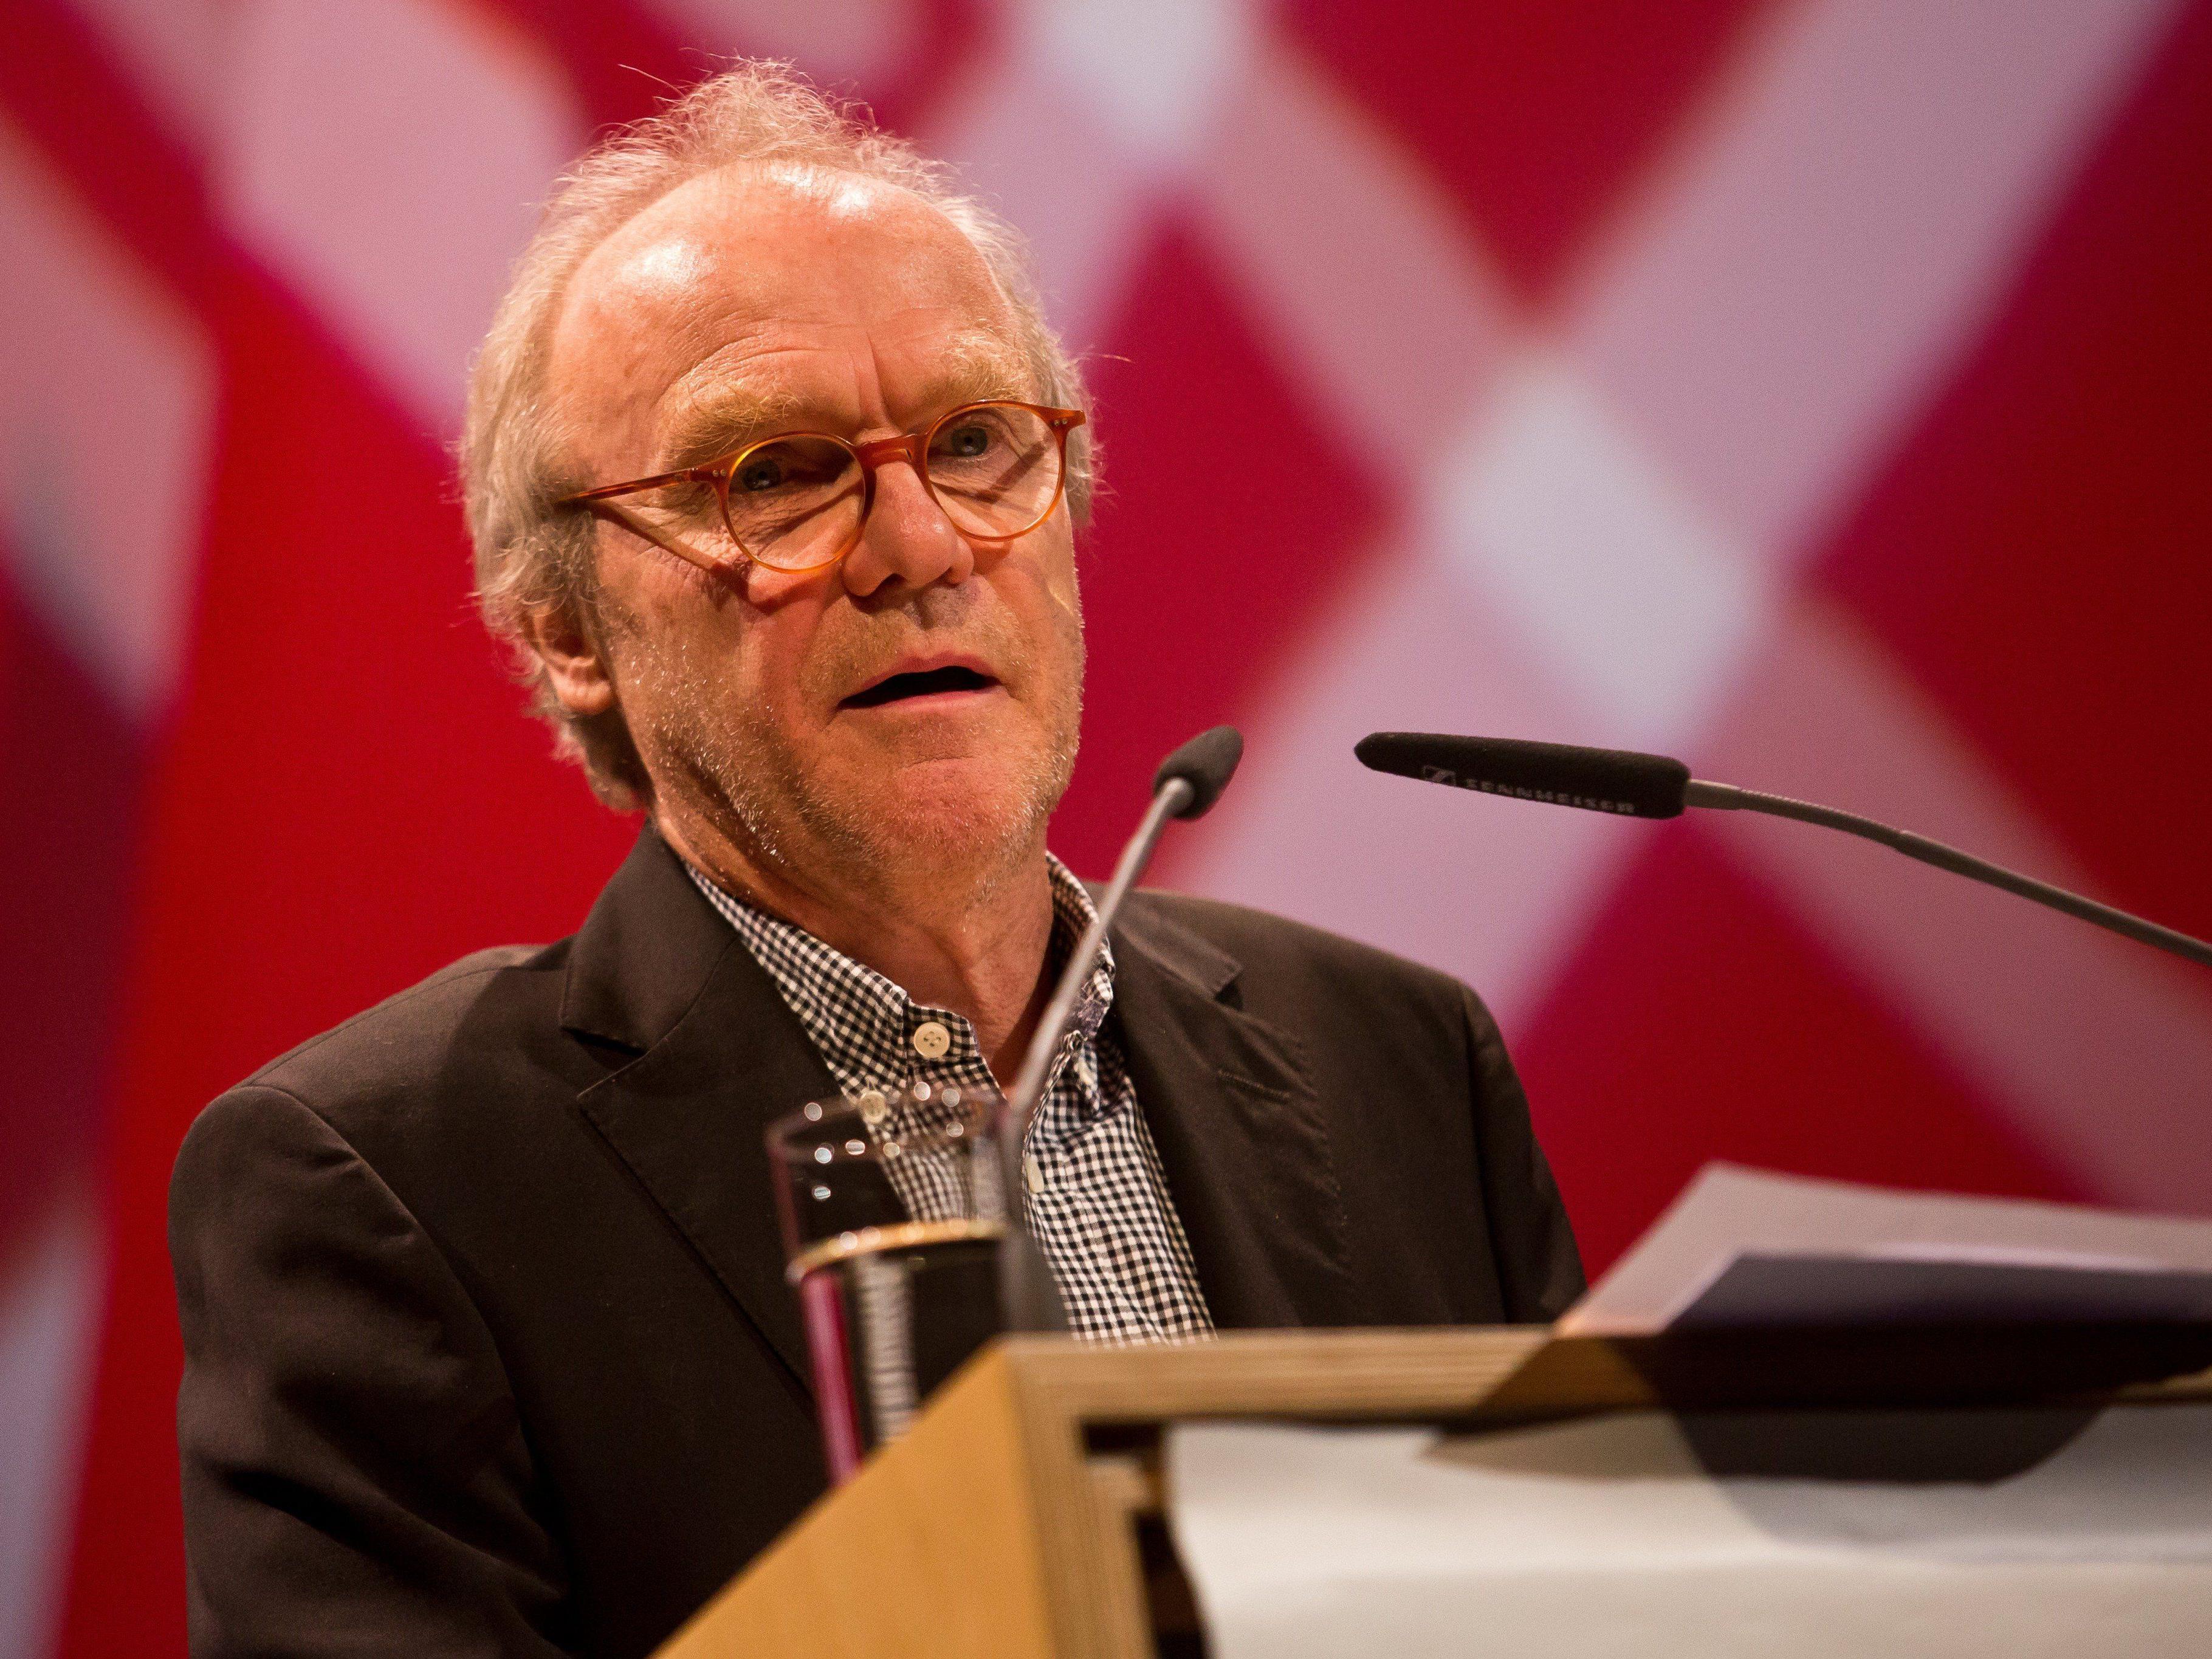 45. Russ-Preis-Verleihung: Laudatio für Michael Köhlmeier